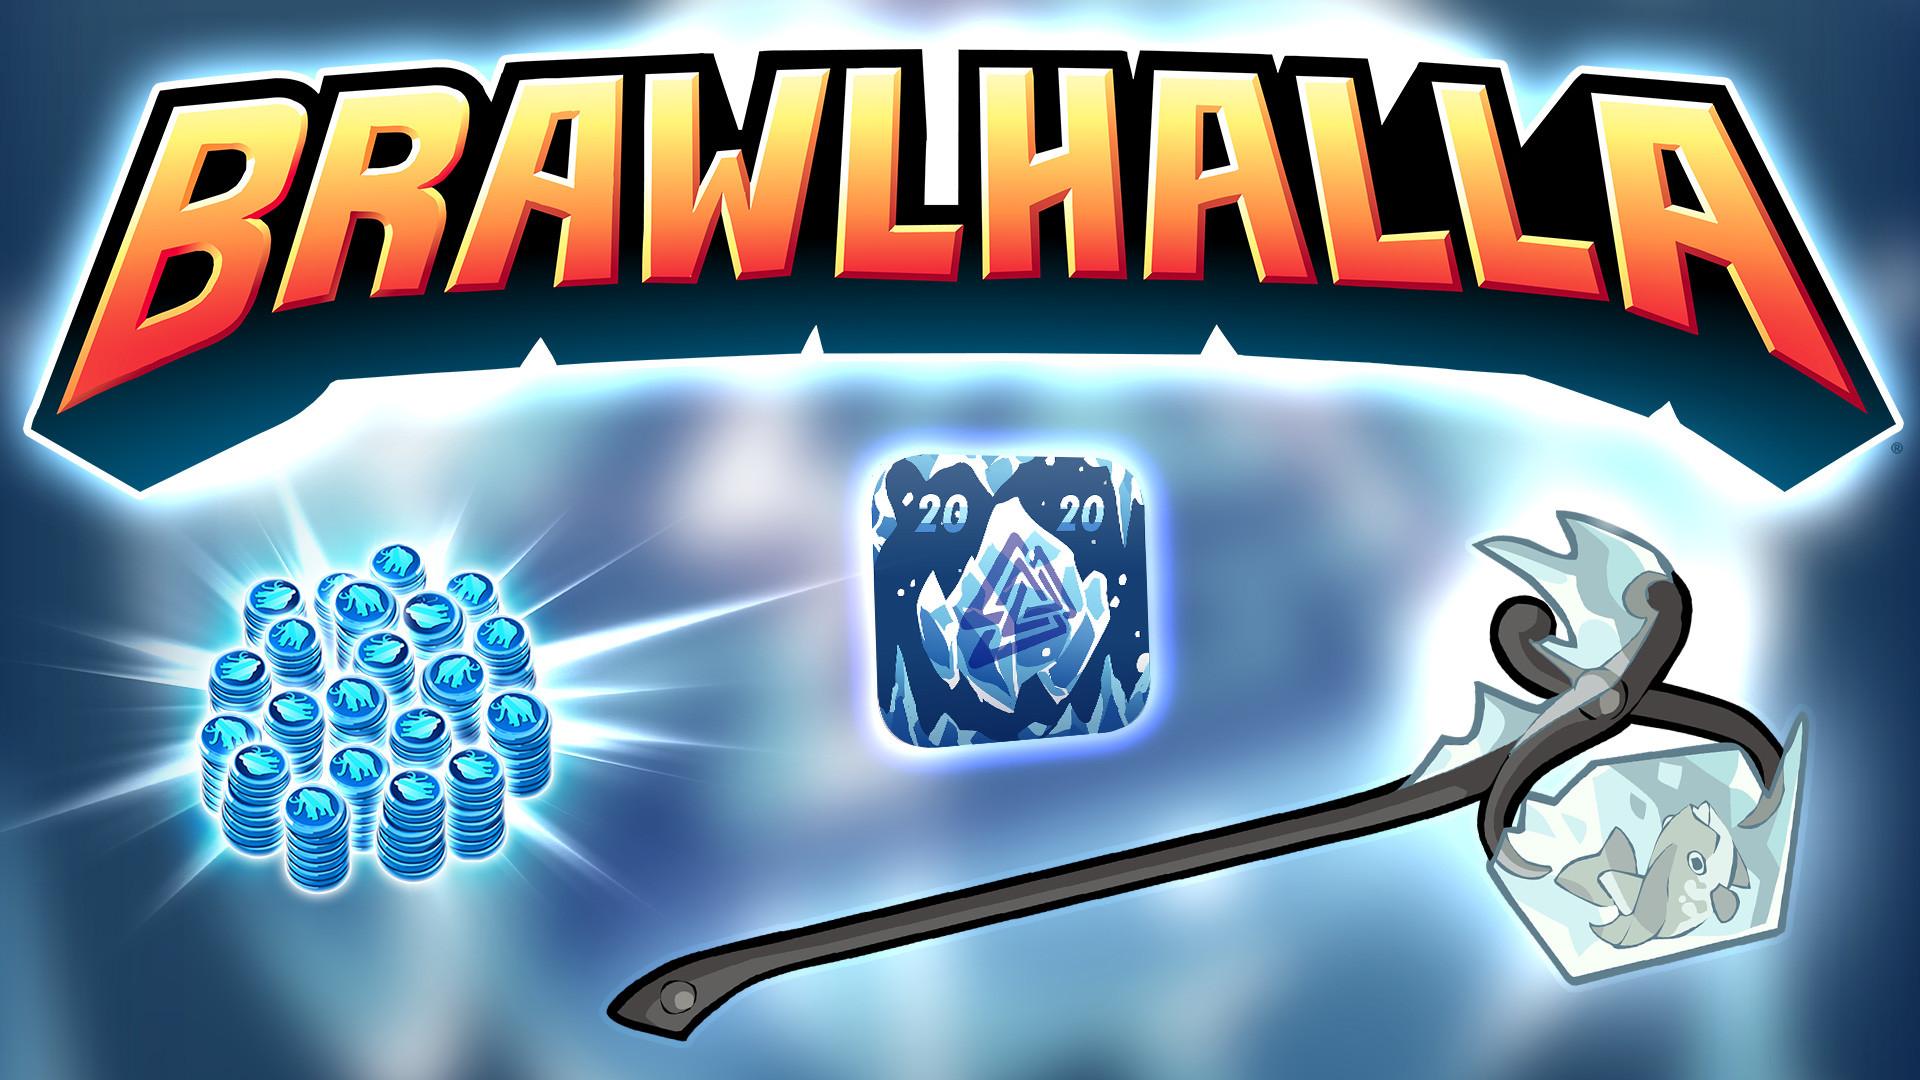 Brawlhalla - Winter Championship 2020 Pack screenshot